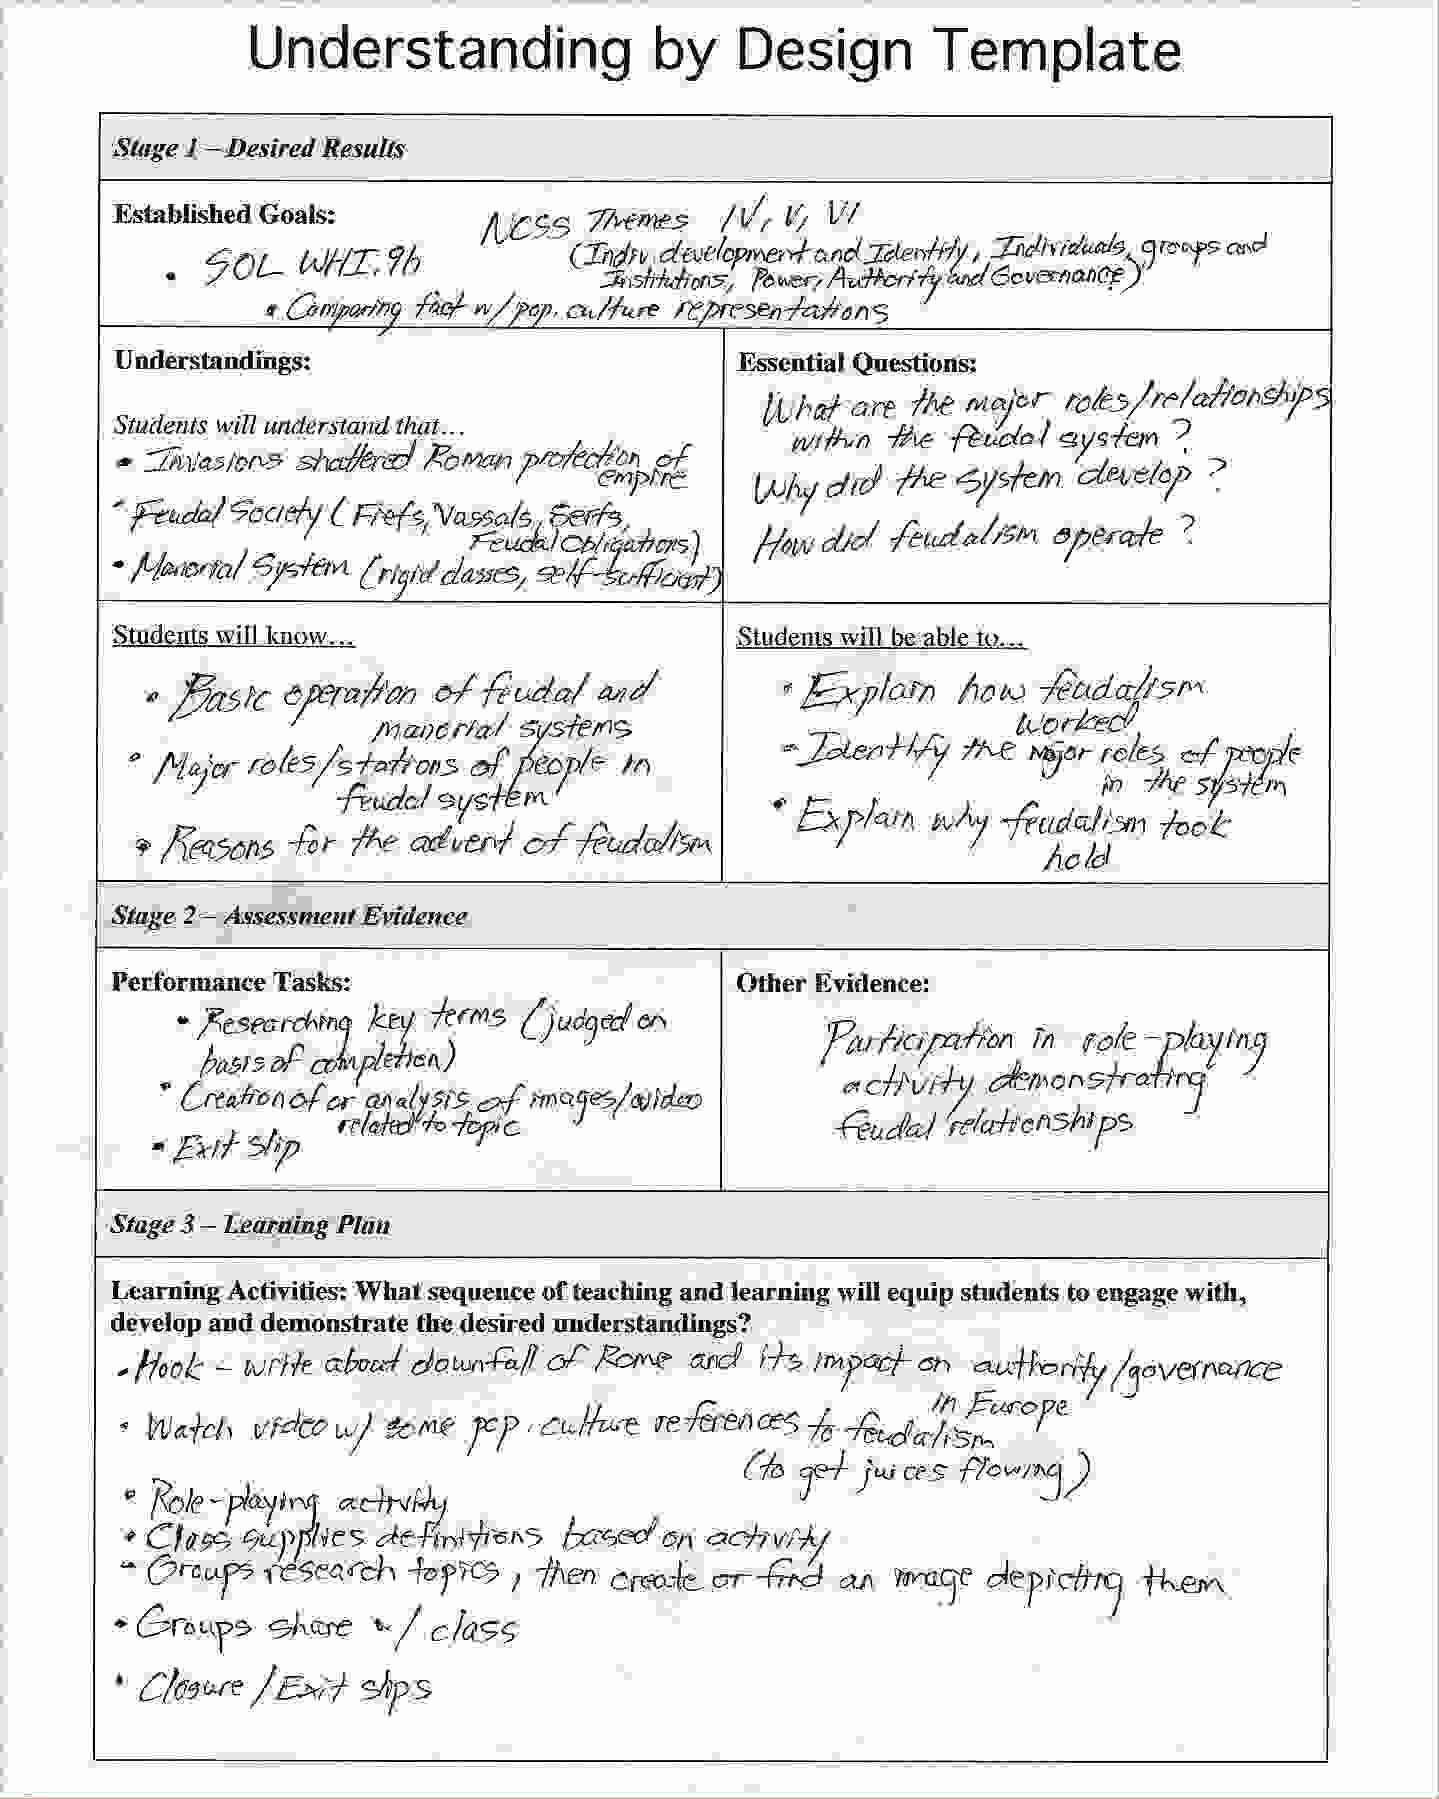 Backward Design Lesson Plan Template Luxury Understanding by Design Template